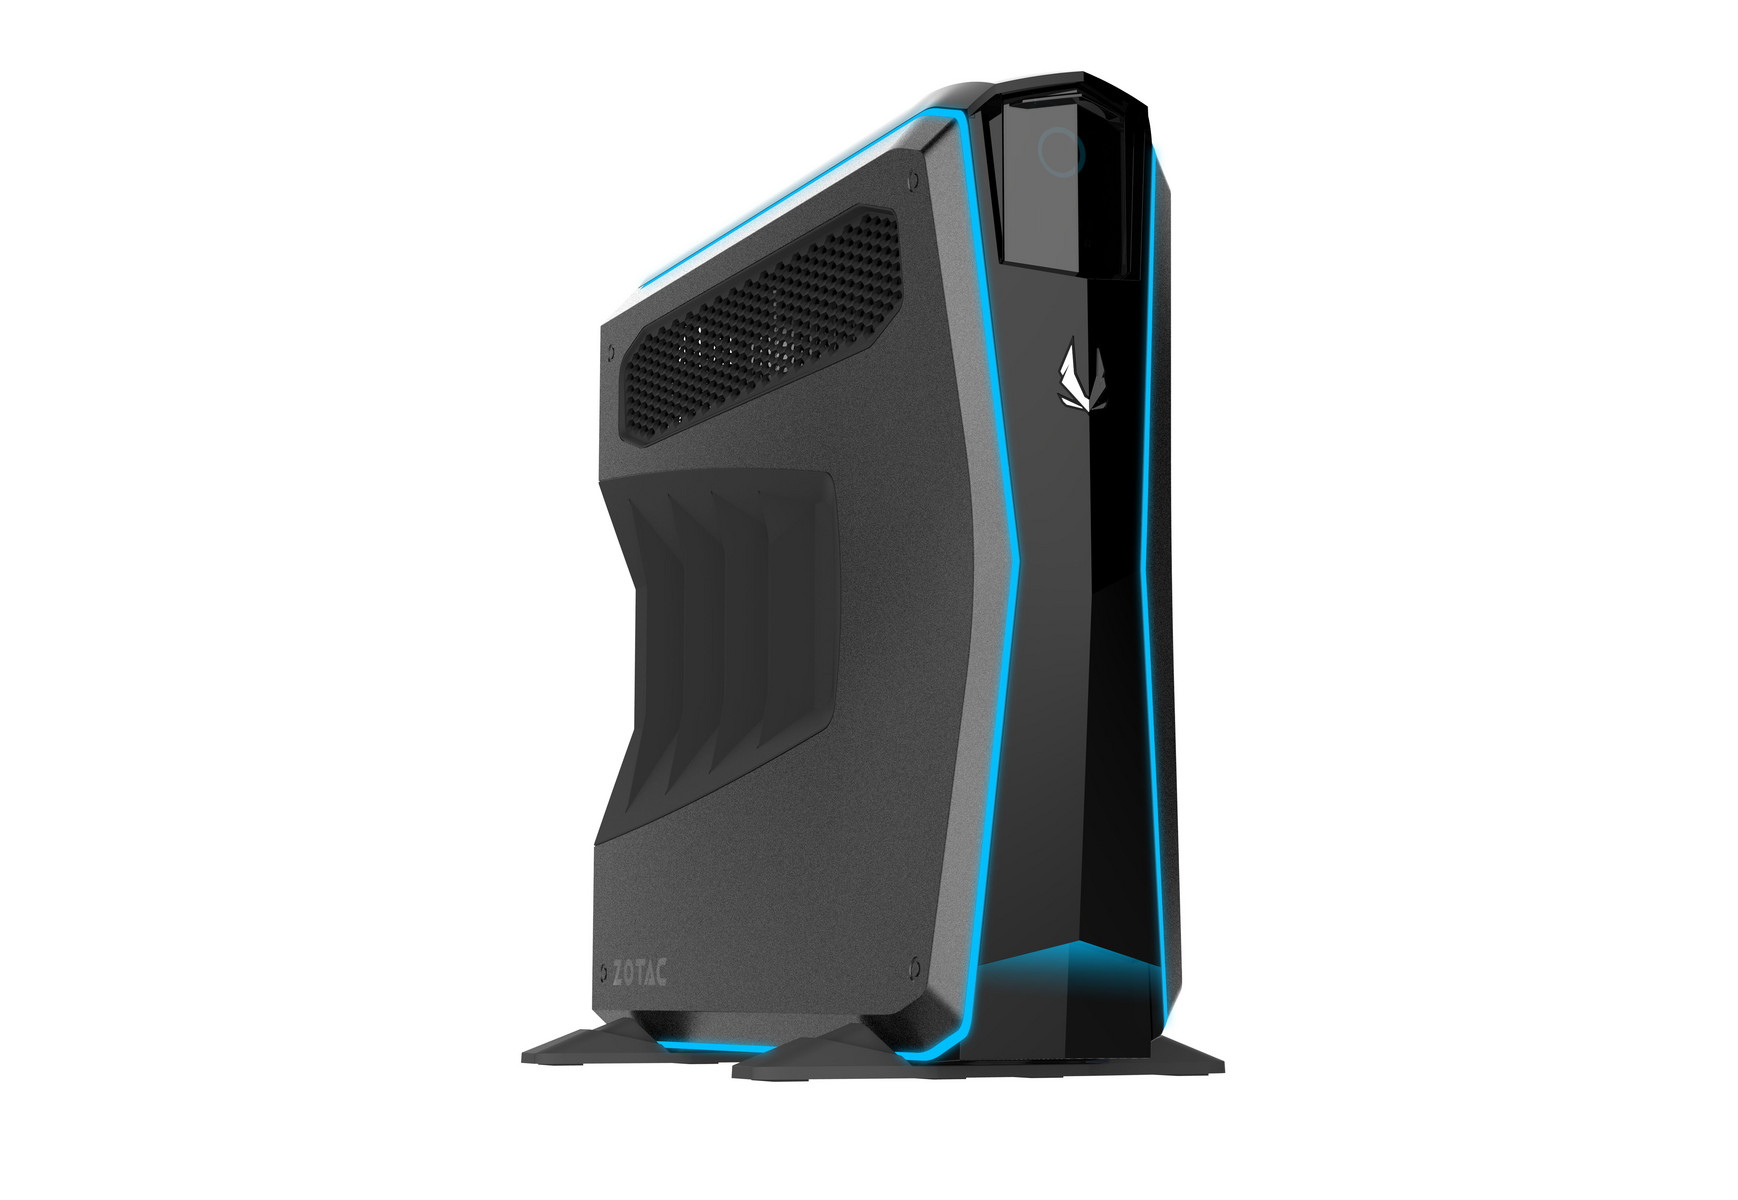 Zotac launches gaming MEK1 mini PC with GTX 1070 Ti graphics